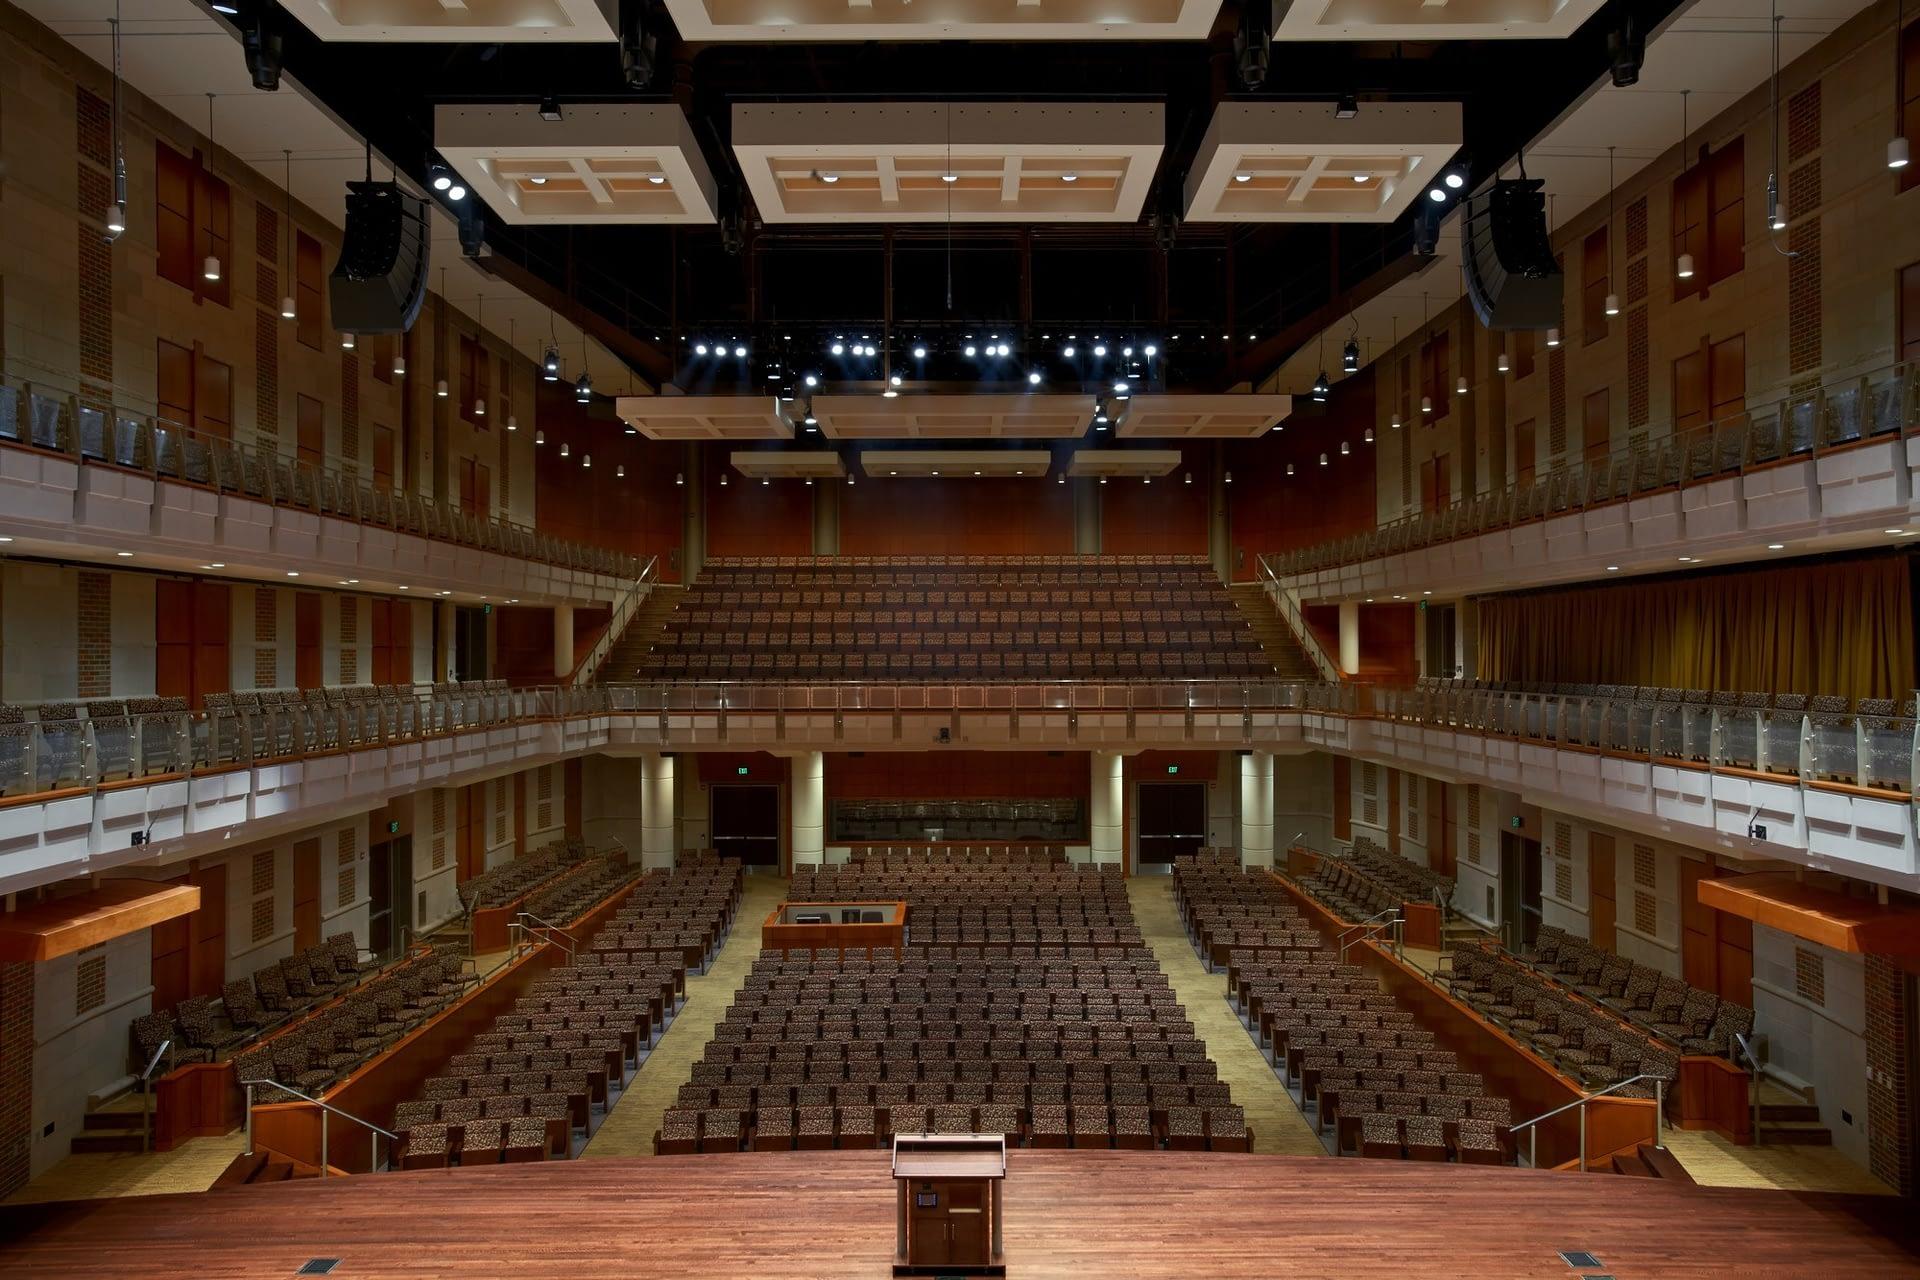 Messiah PA - Auditorium